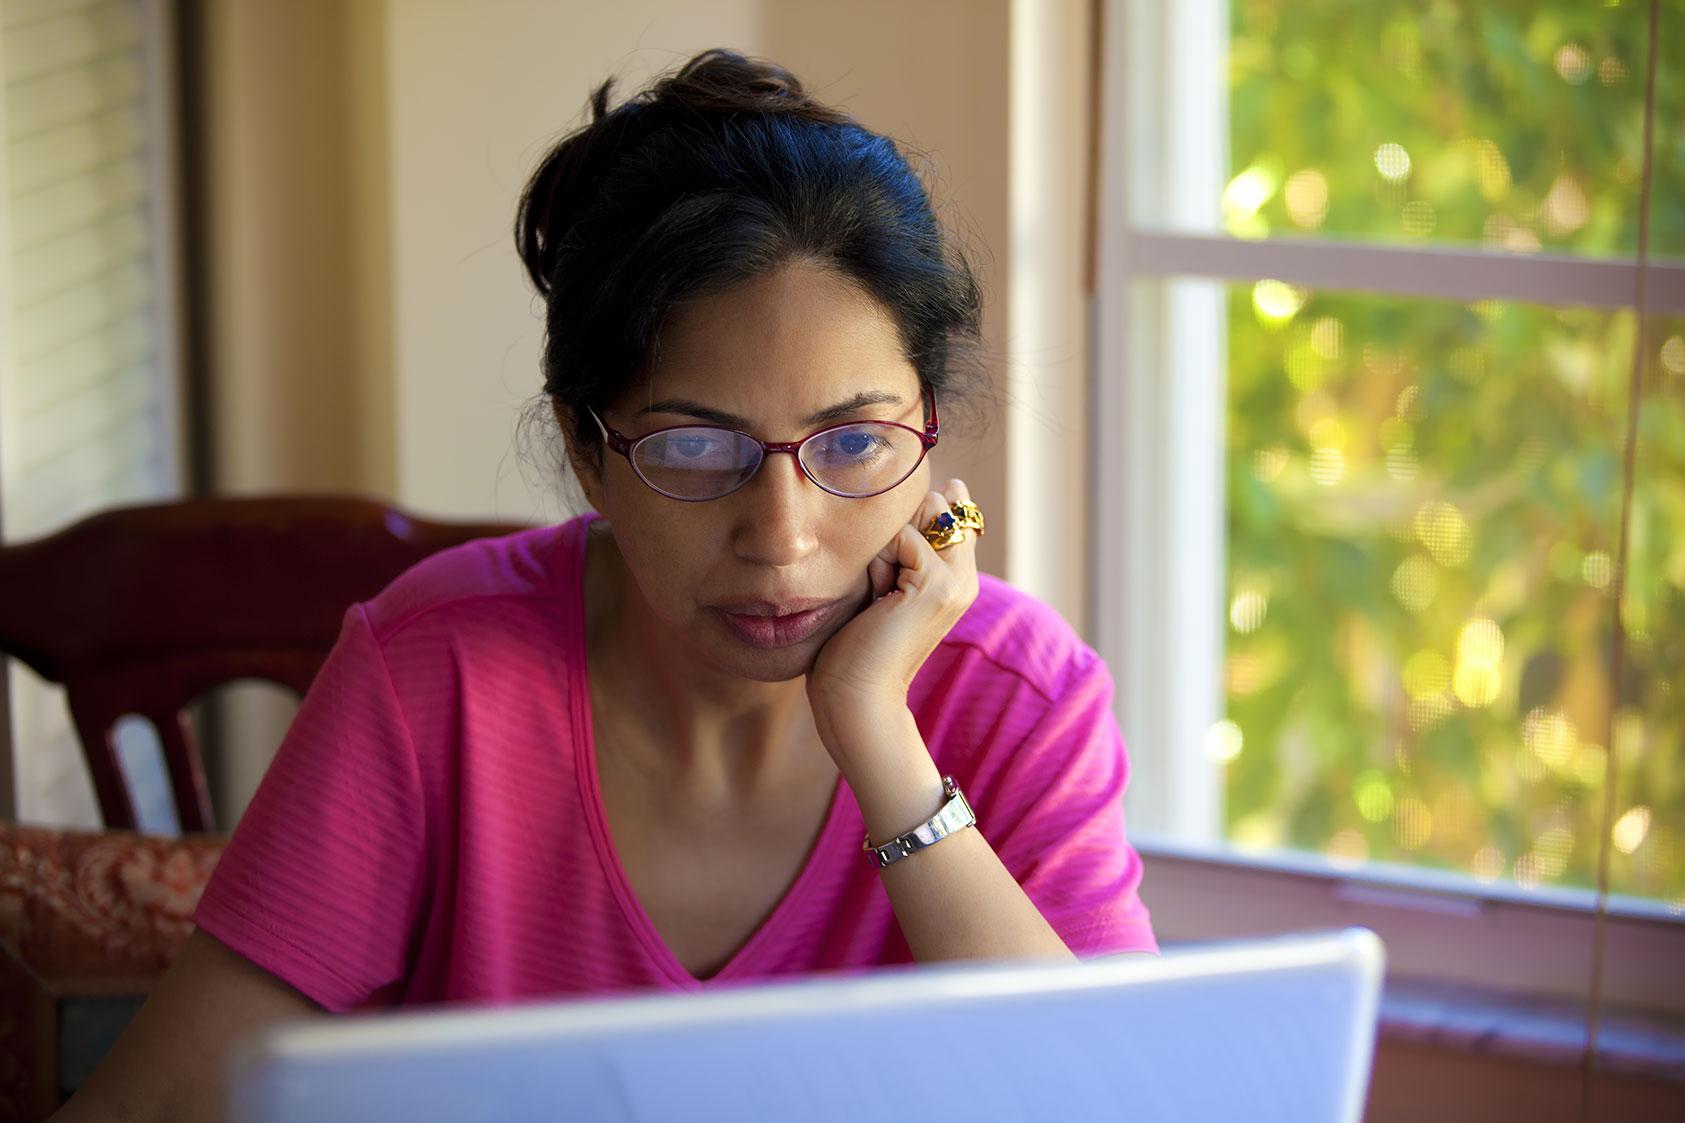 Woman reading about neurofeedback